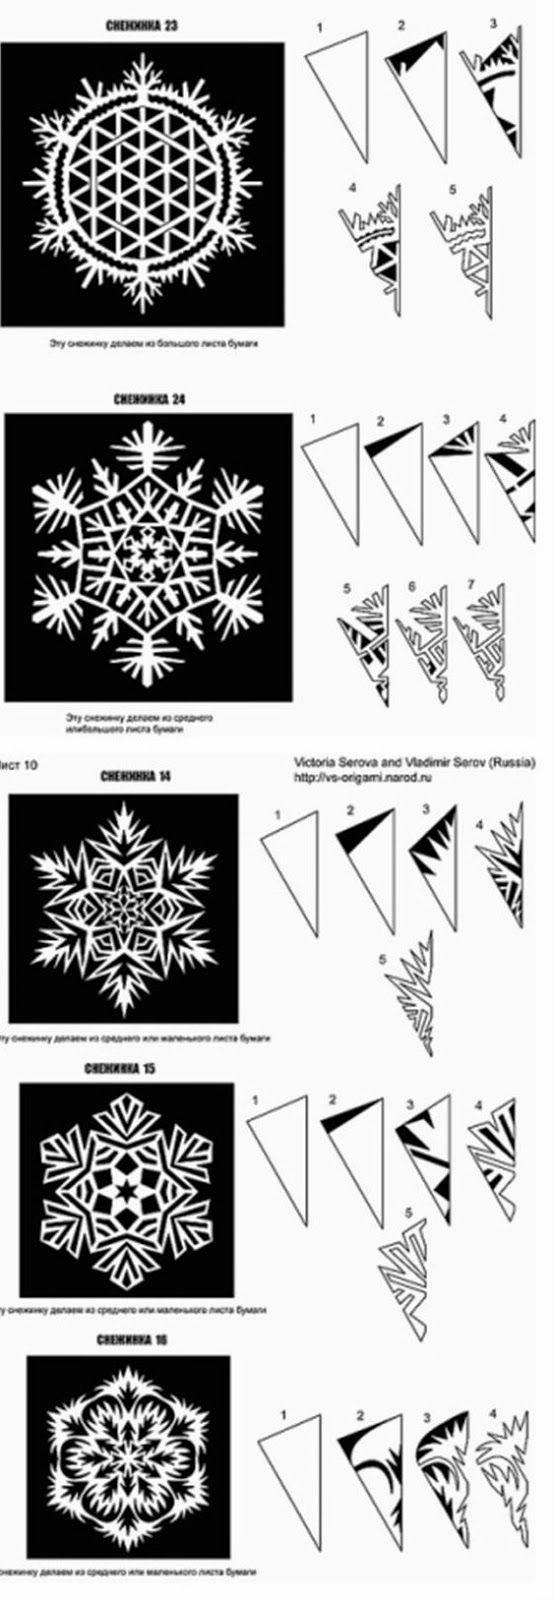 Diy Frozen 34 Snowflakes Templates Things To Make Pinterest